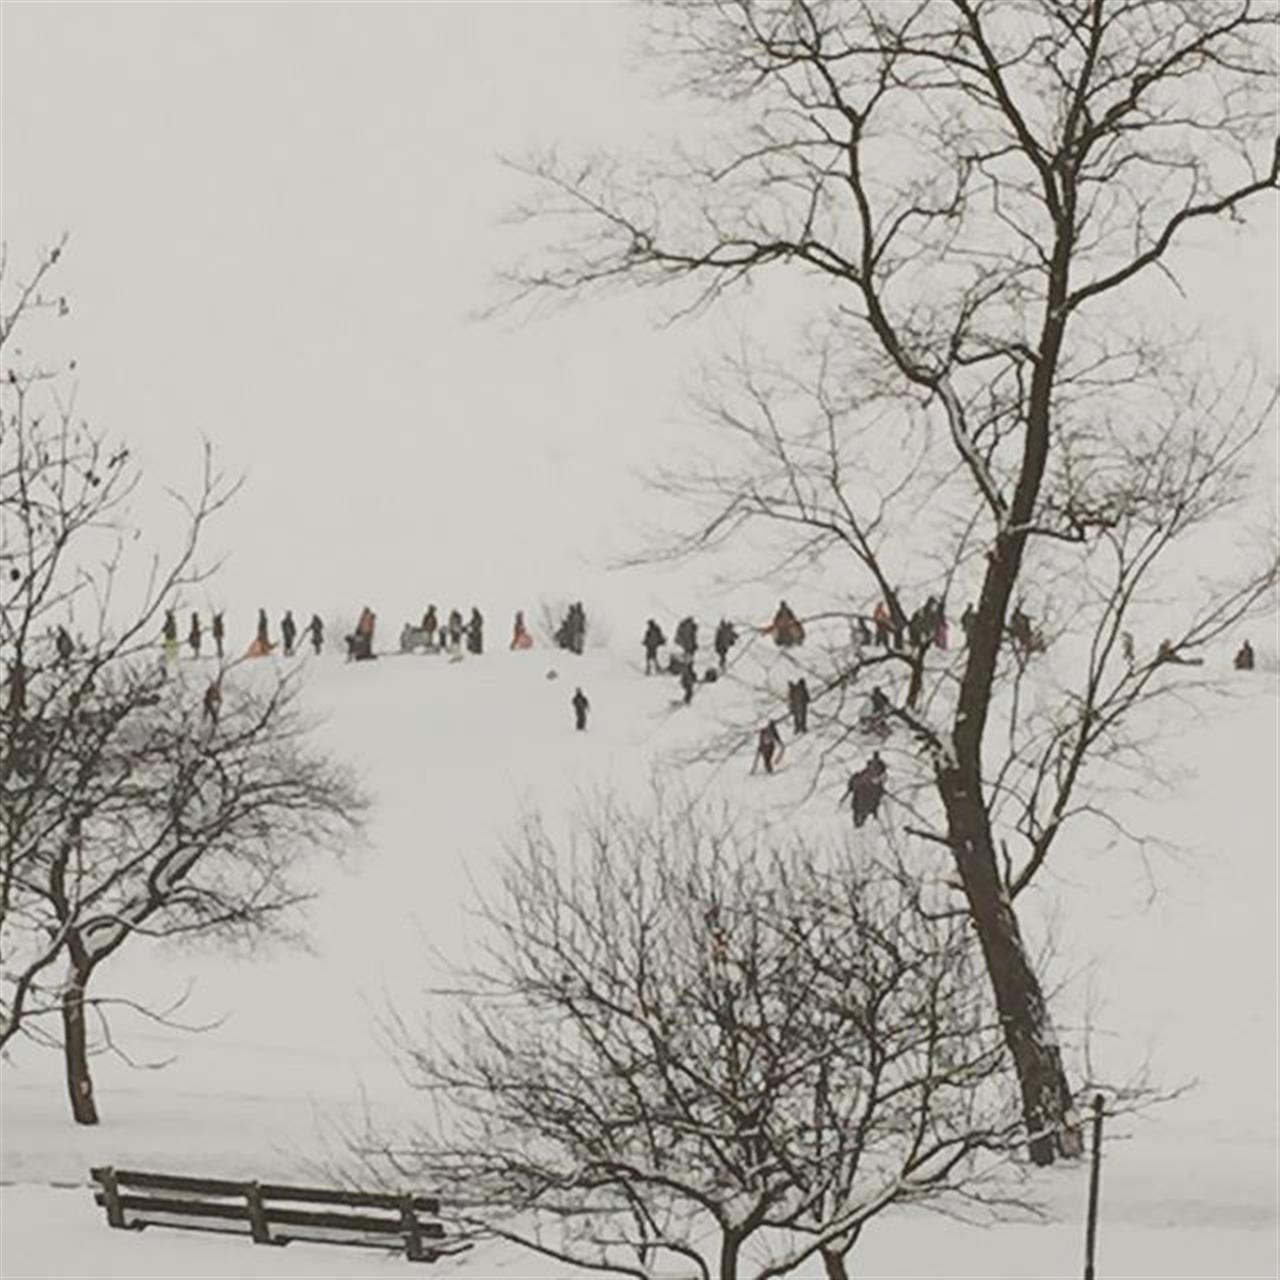 Sledding at Montrose hill  #LivingWellinChicago #realestate #leadingrelocal #chicago #howtosellyourhome #bestjobintheworld #uptown  #winterfun  #bairdwarner #findmychicagohome #lincolnpark #cityliving #winterscenes